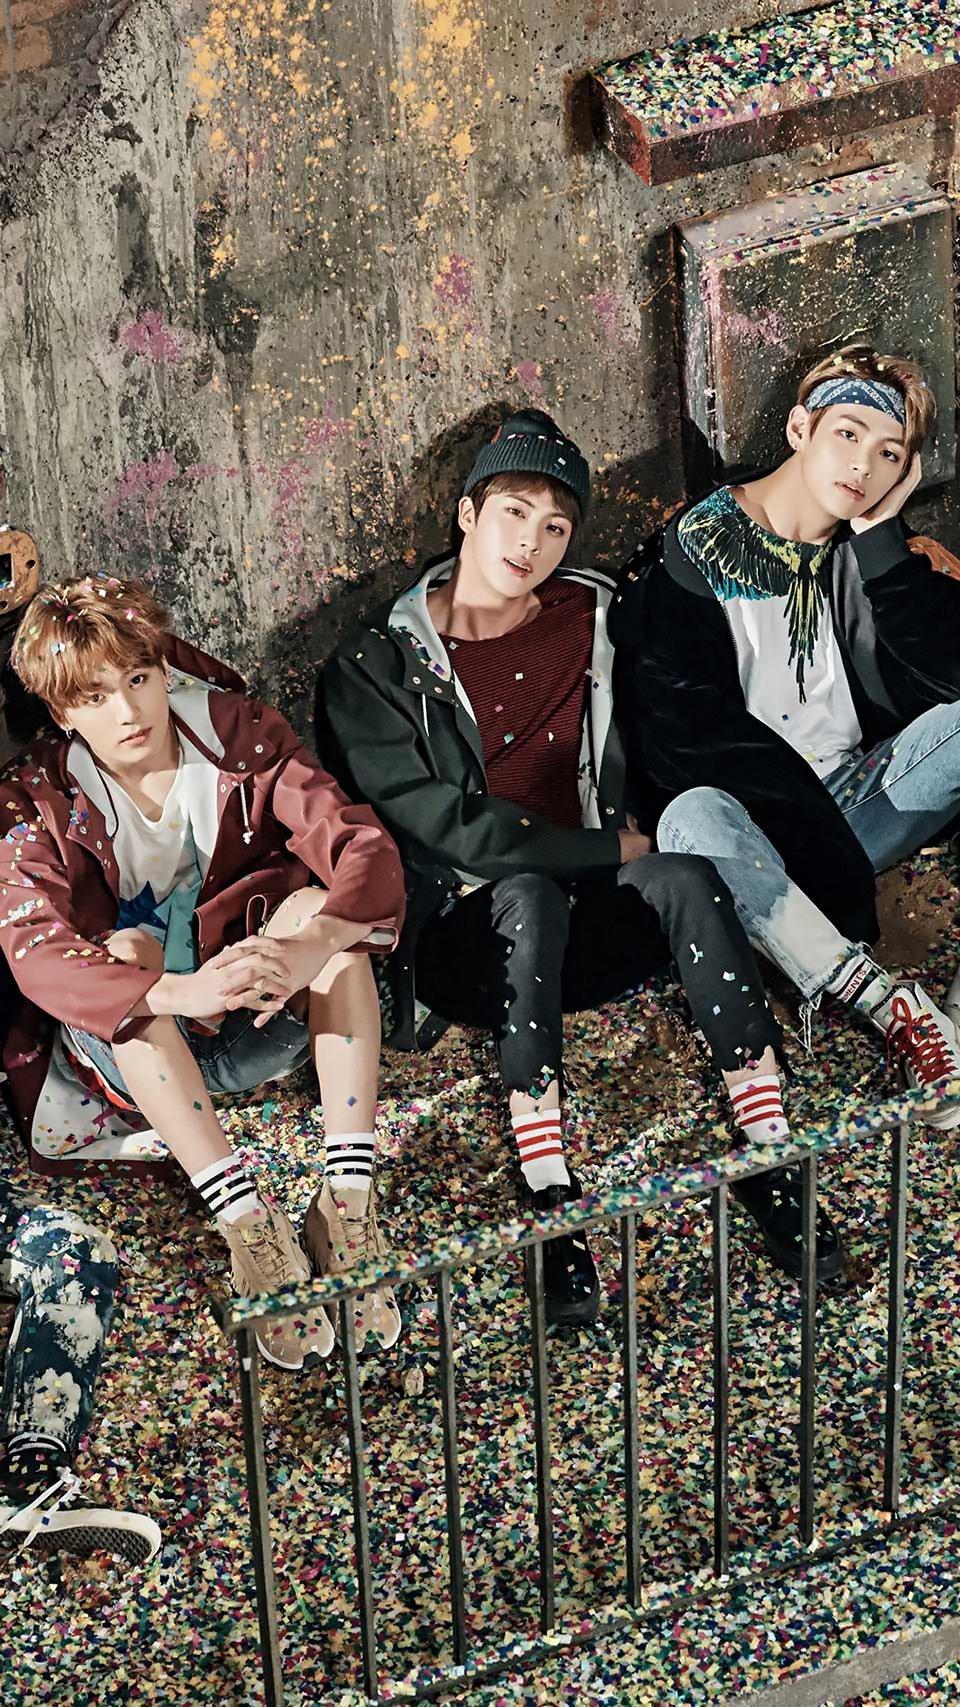 Wallpaper BTS: J-Hope, Jimin, Jin, Jungkook, RM, Suga y V Vertical